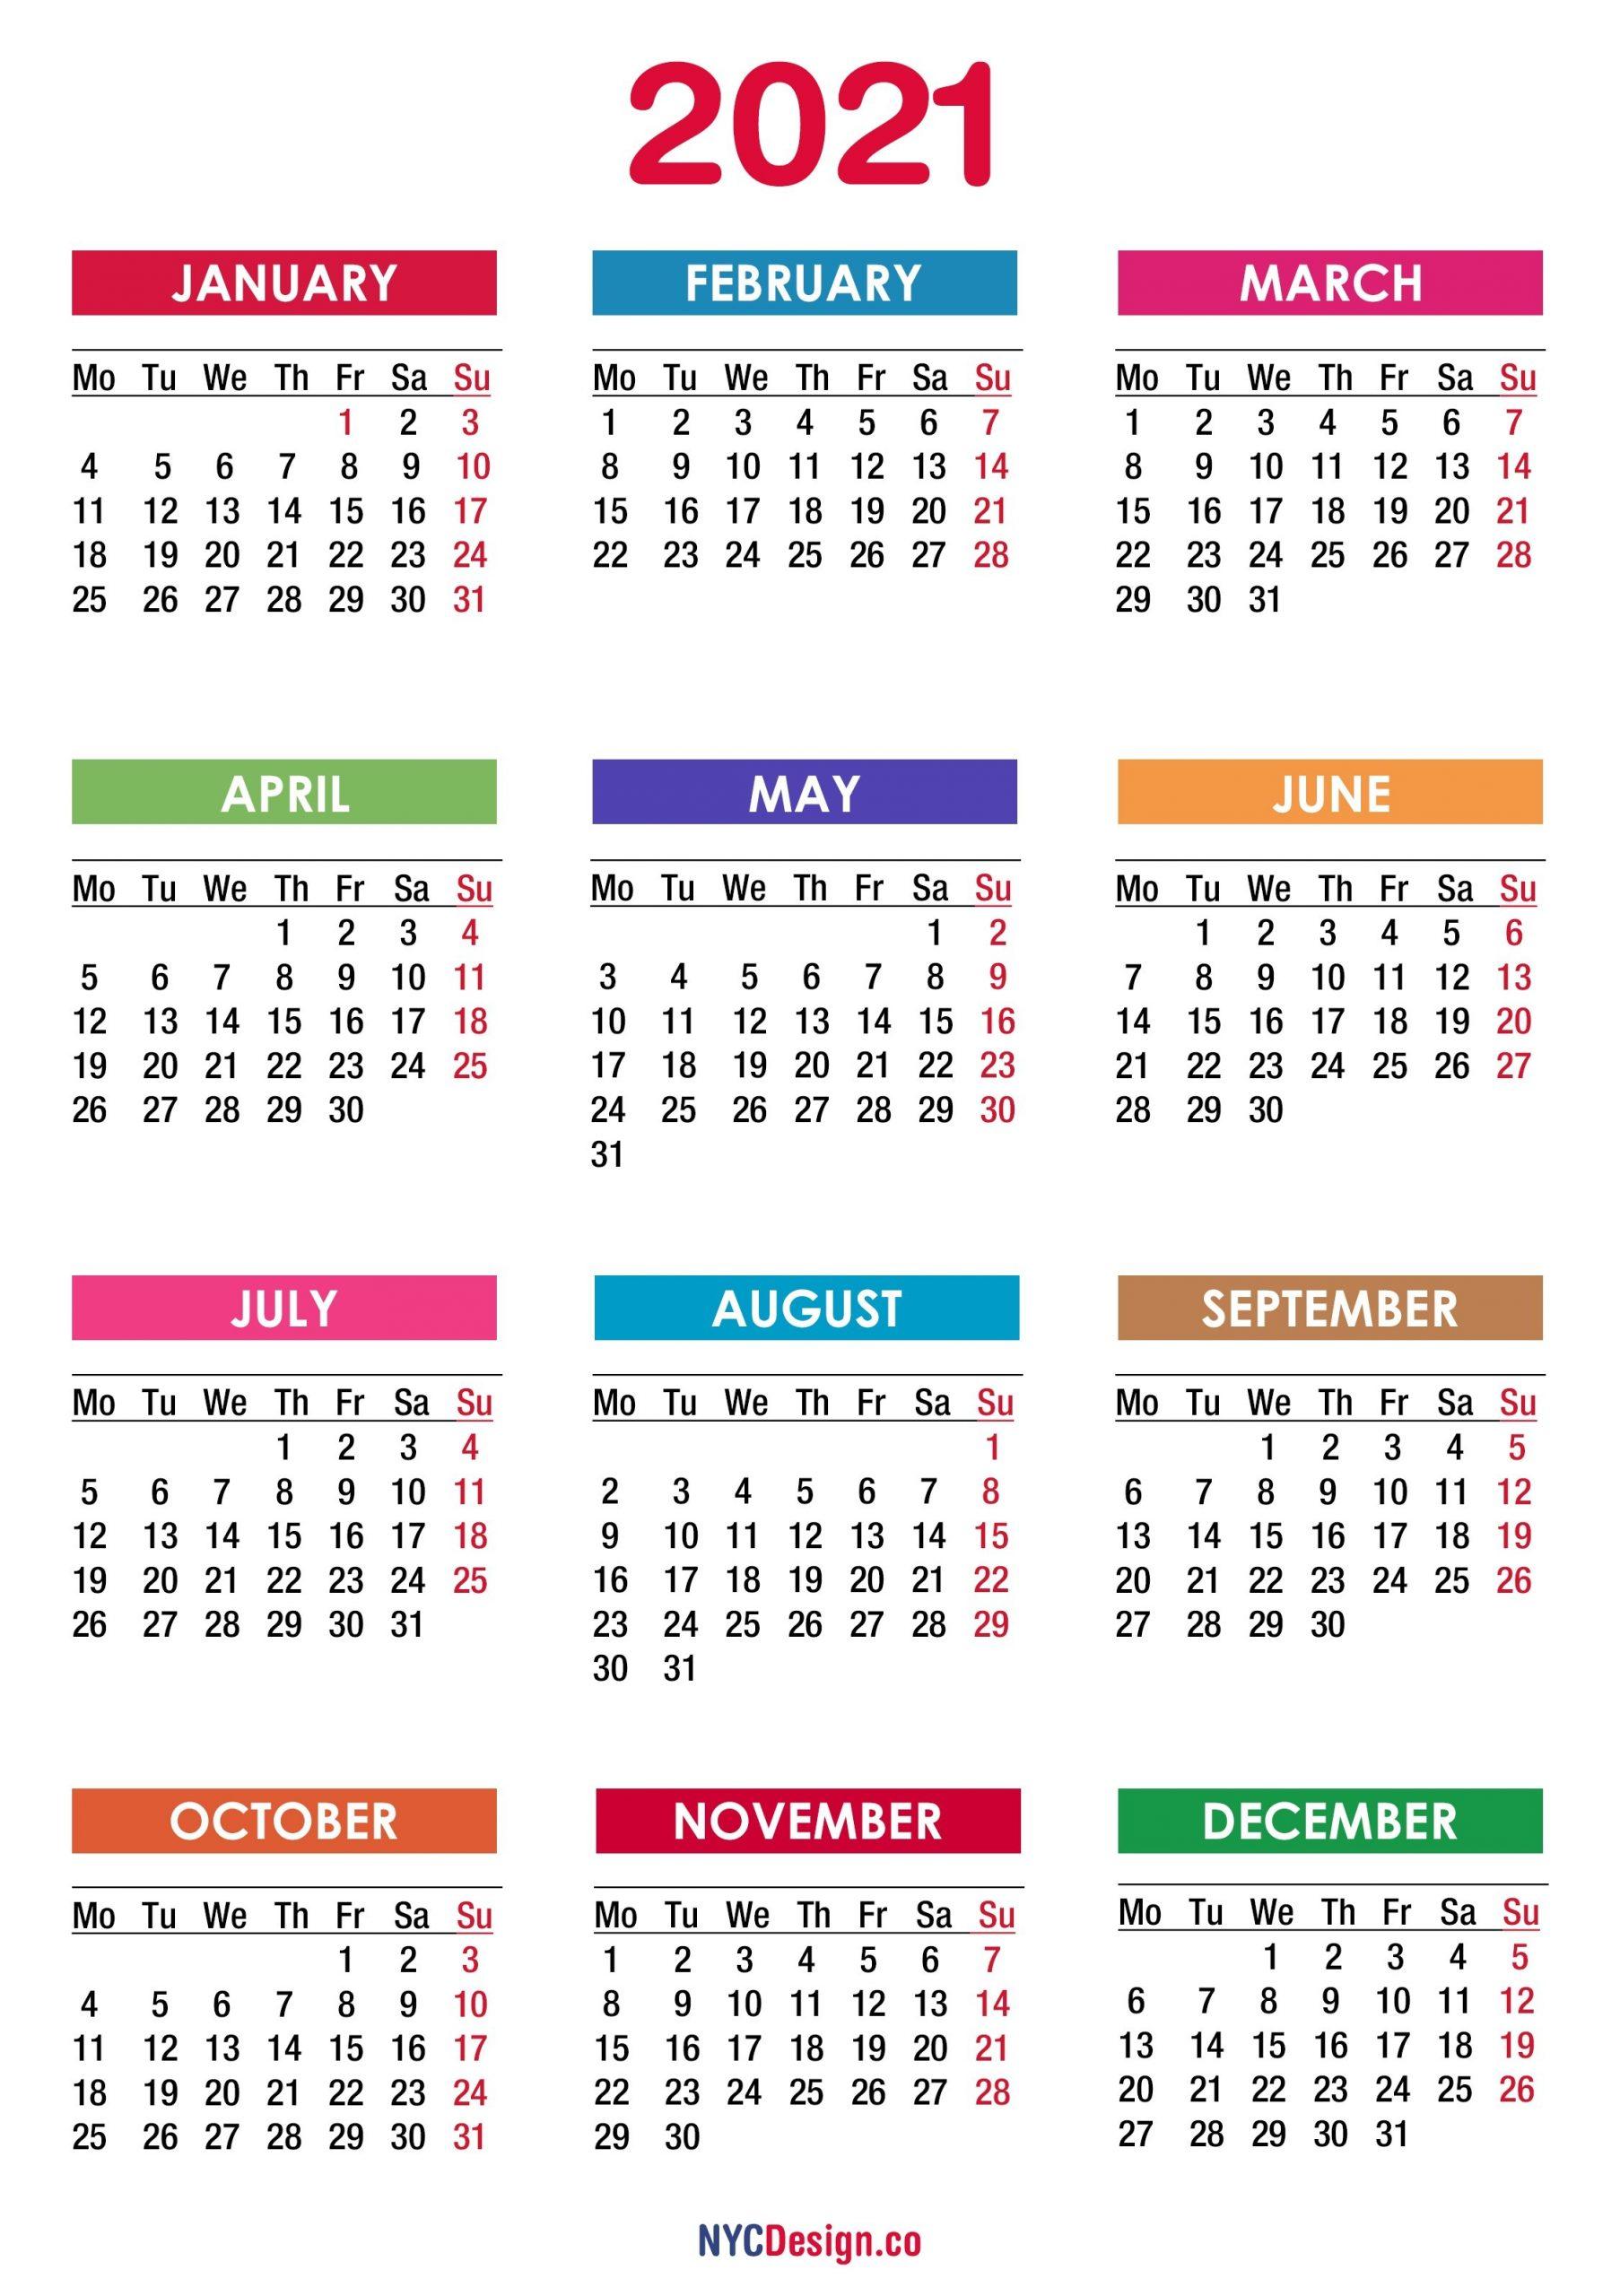 2021 Calendar Printable Free, Pdf, Colorful - Monday Start - Nycdesign.co   Calendars Printable Free regarding Calendar 2019 2021 2021 Printable Free Photo